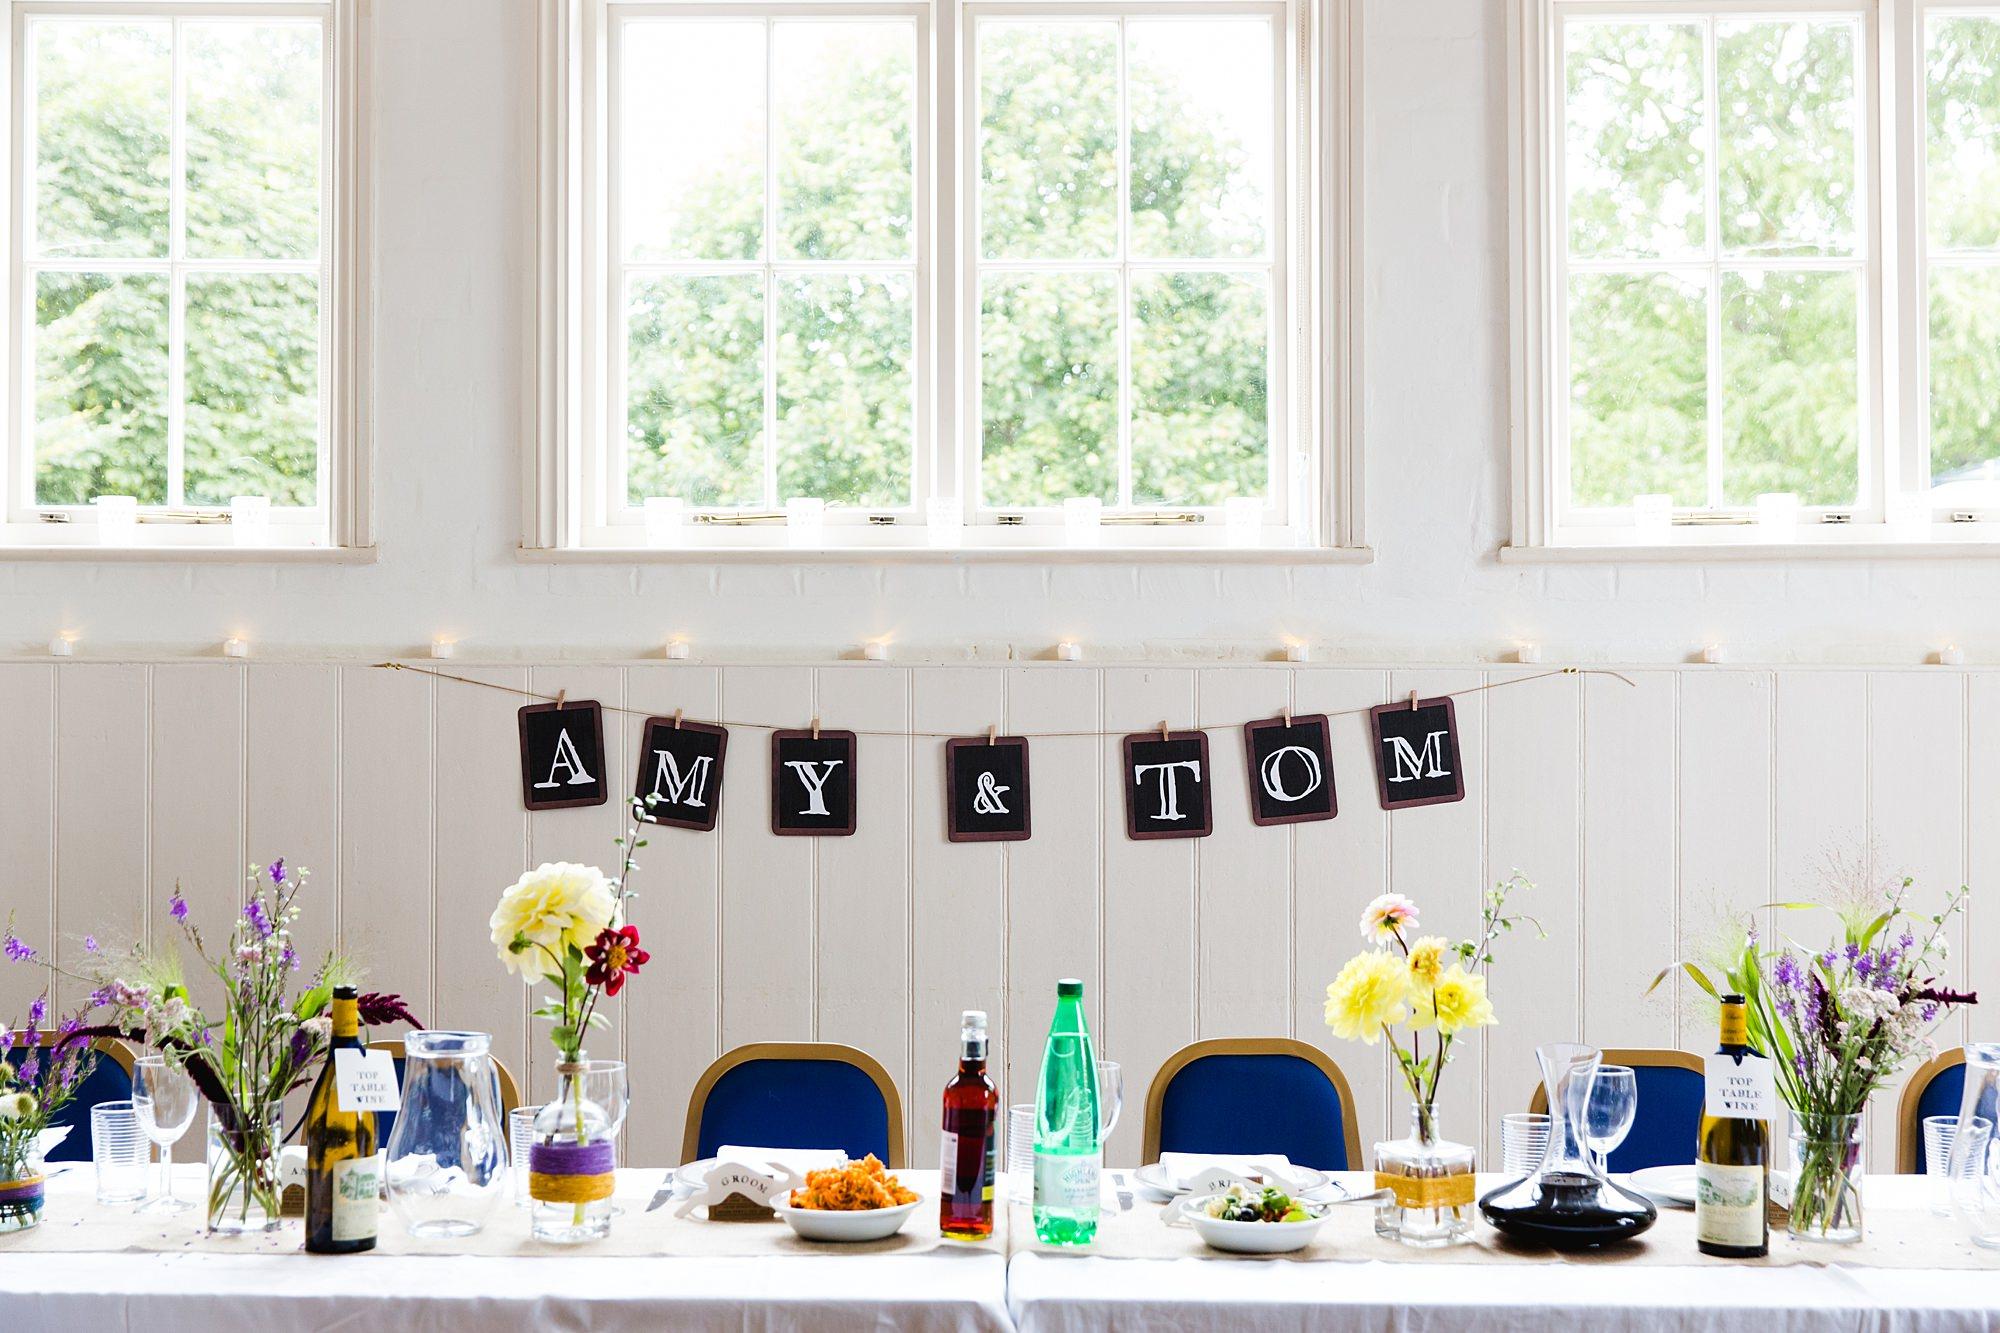 Fun village hall wedding DIY table decorations